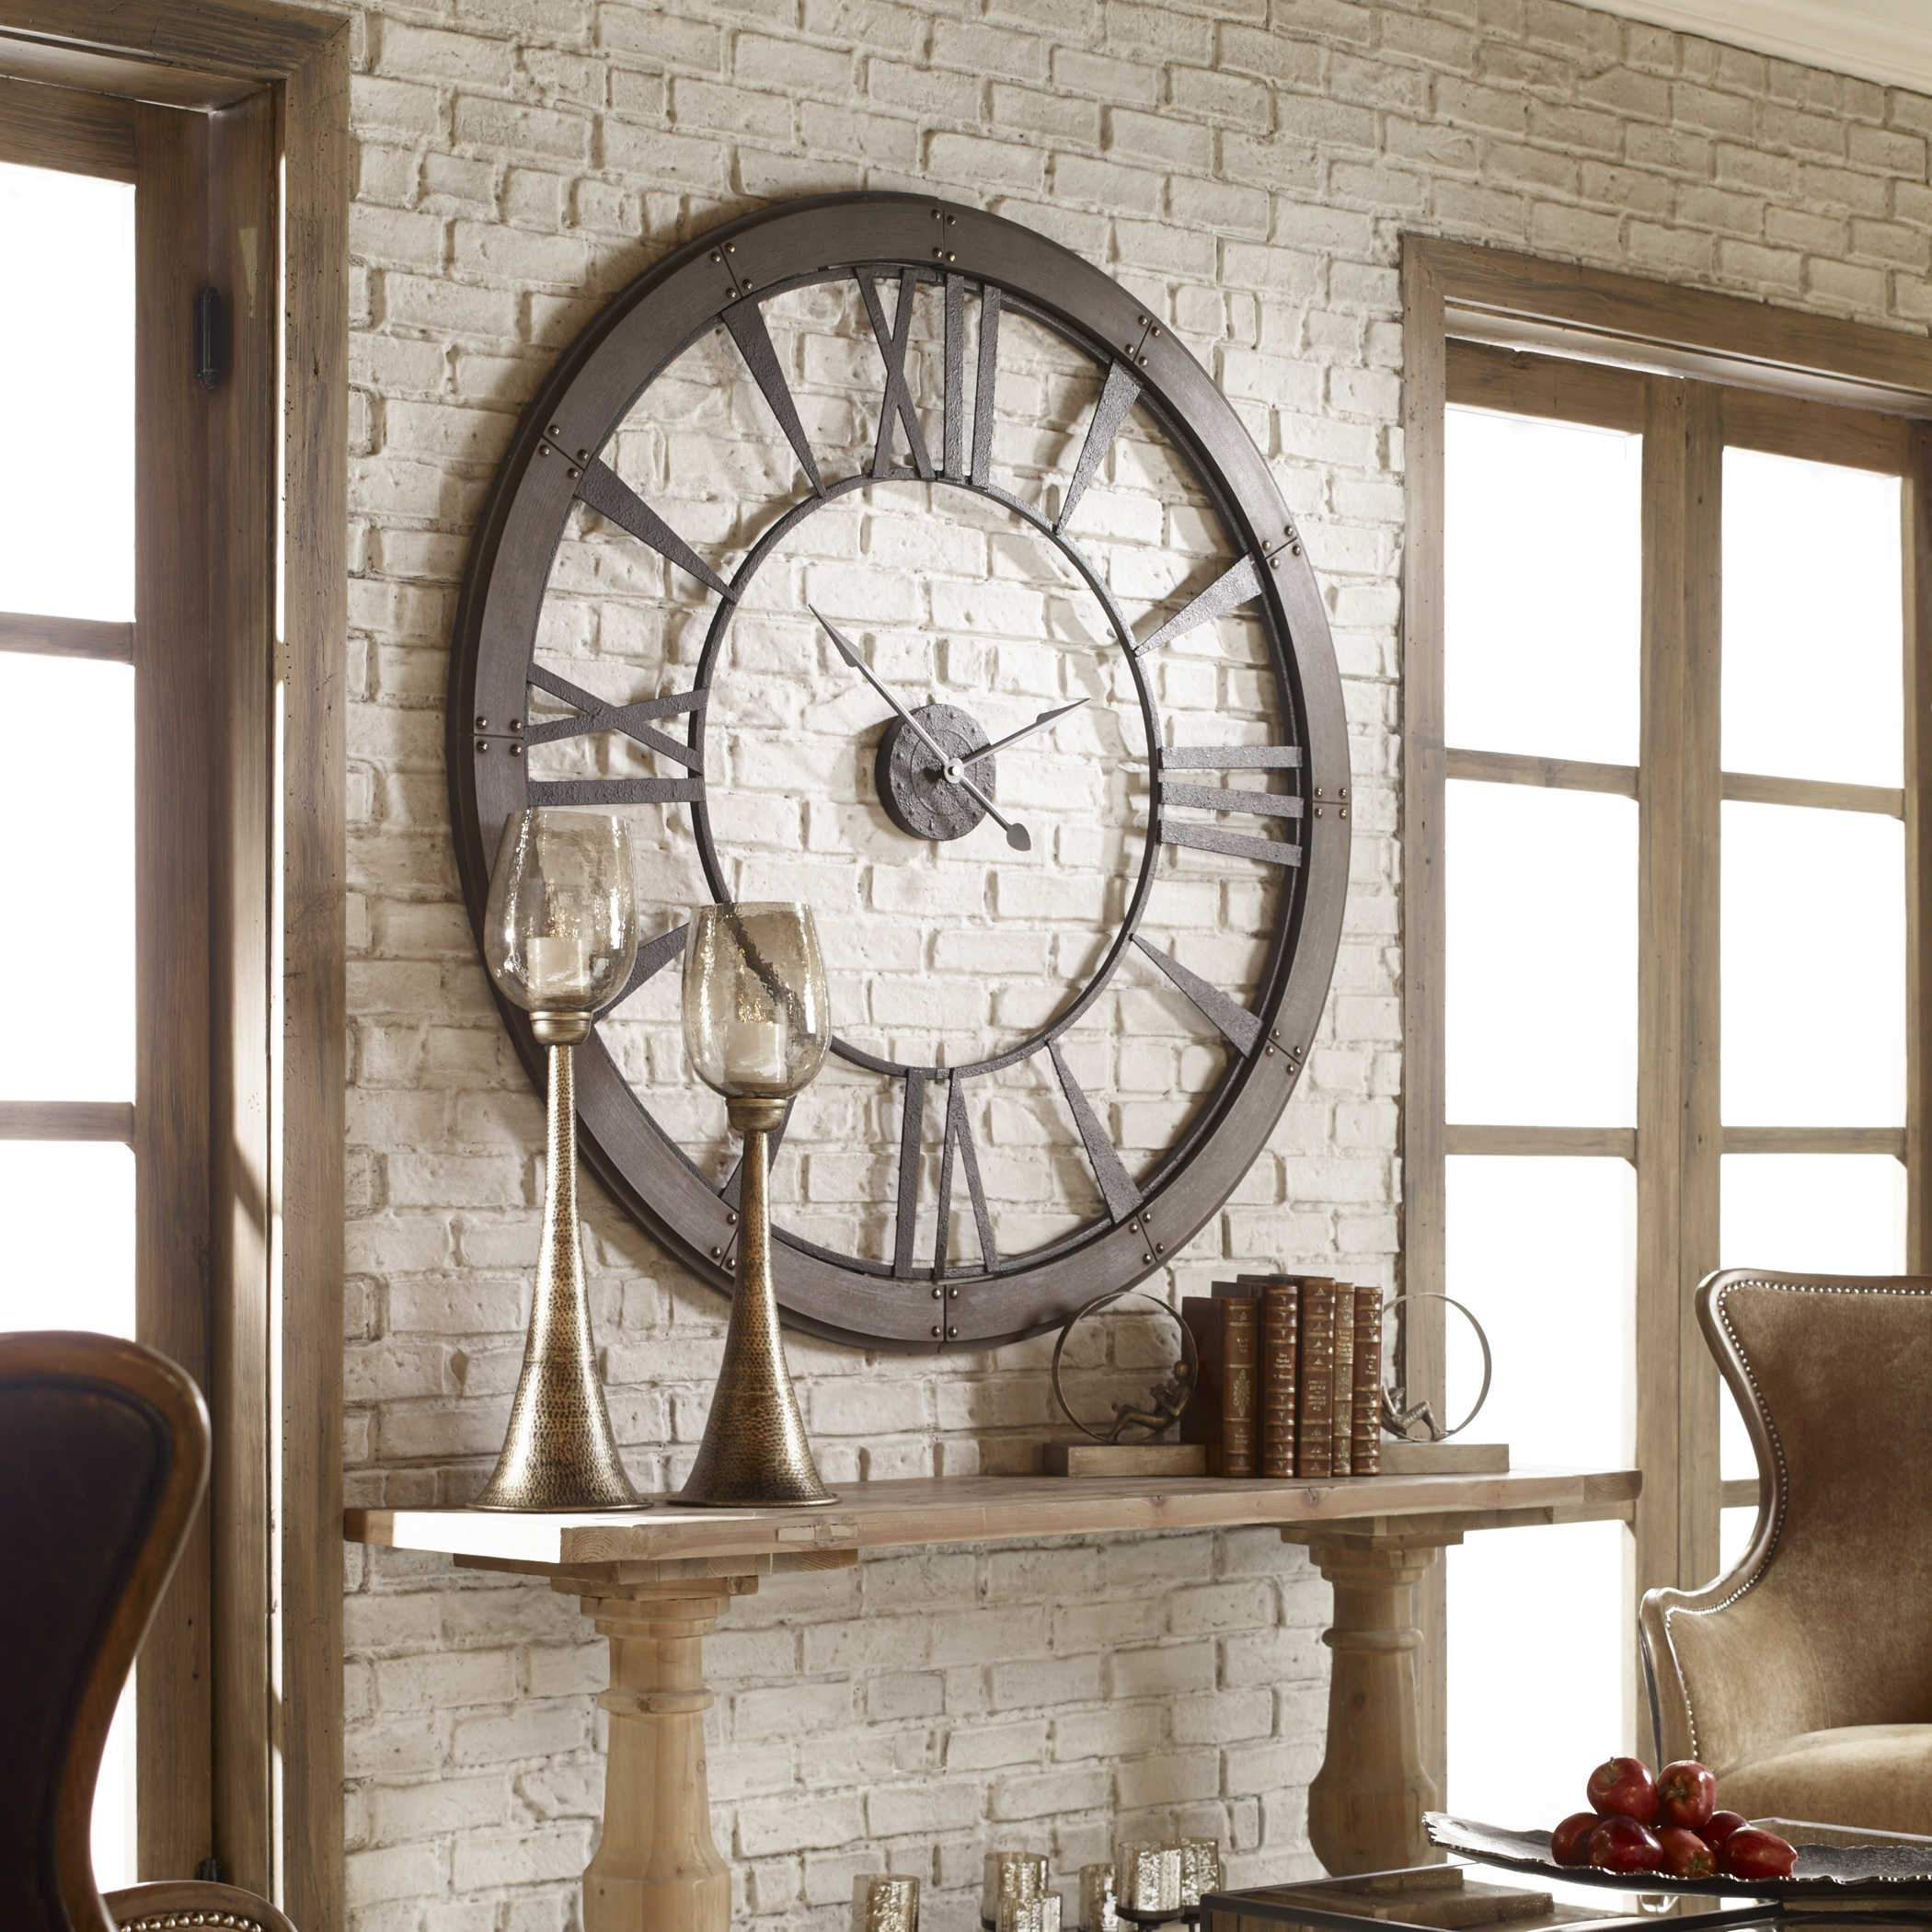 Ronan Wall Clock In 2021 Big Wall Clocks Gallery Wall Clock Clock Wall Decor